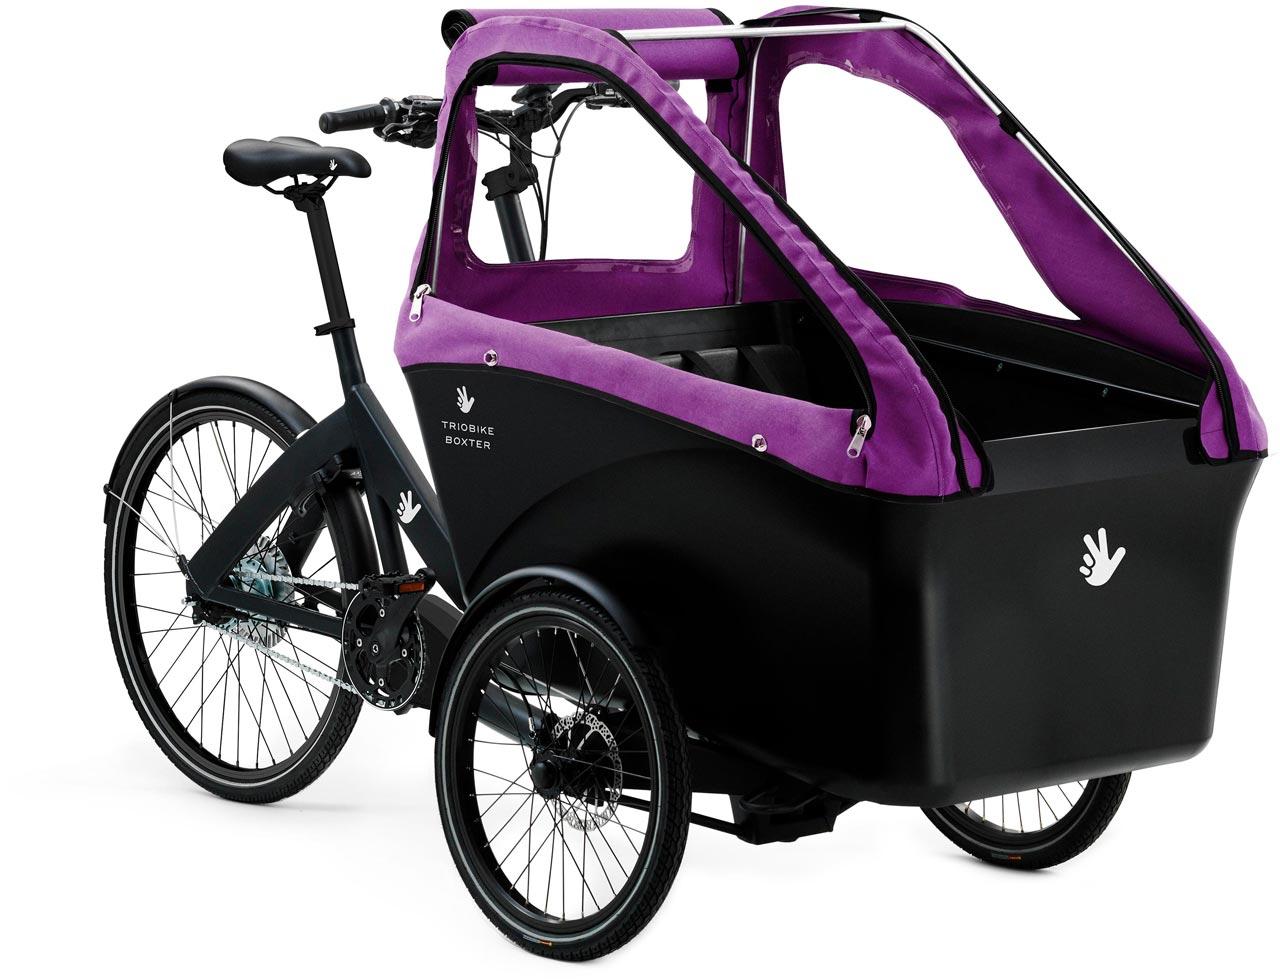 Triobike Boxter E Nexus Lasten e-Bike / Cargo e-Bike 2020